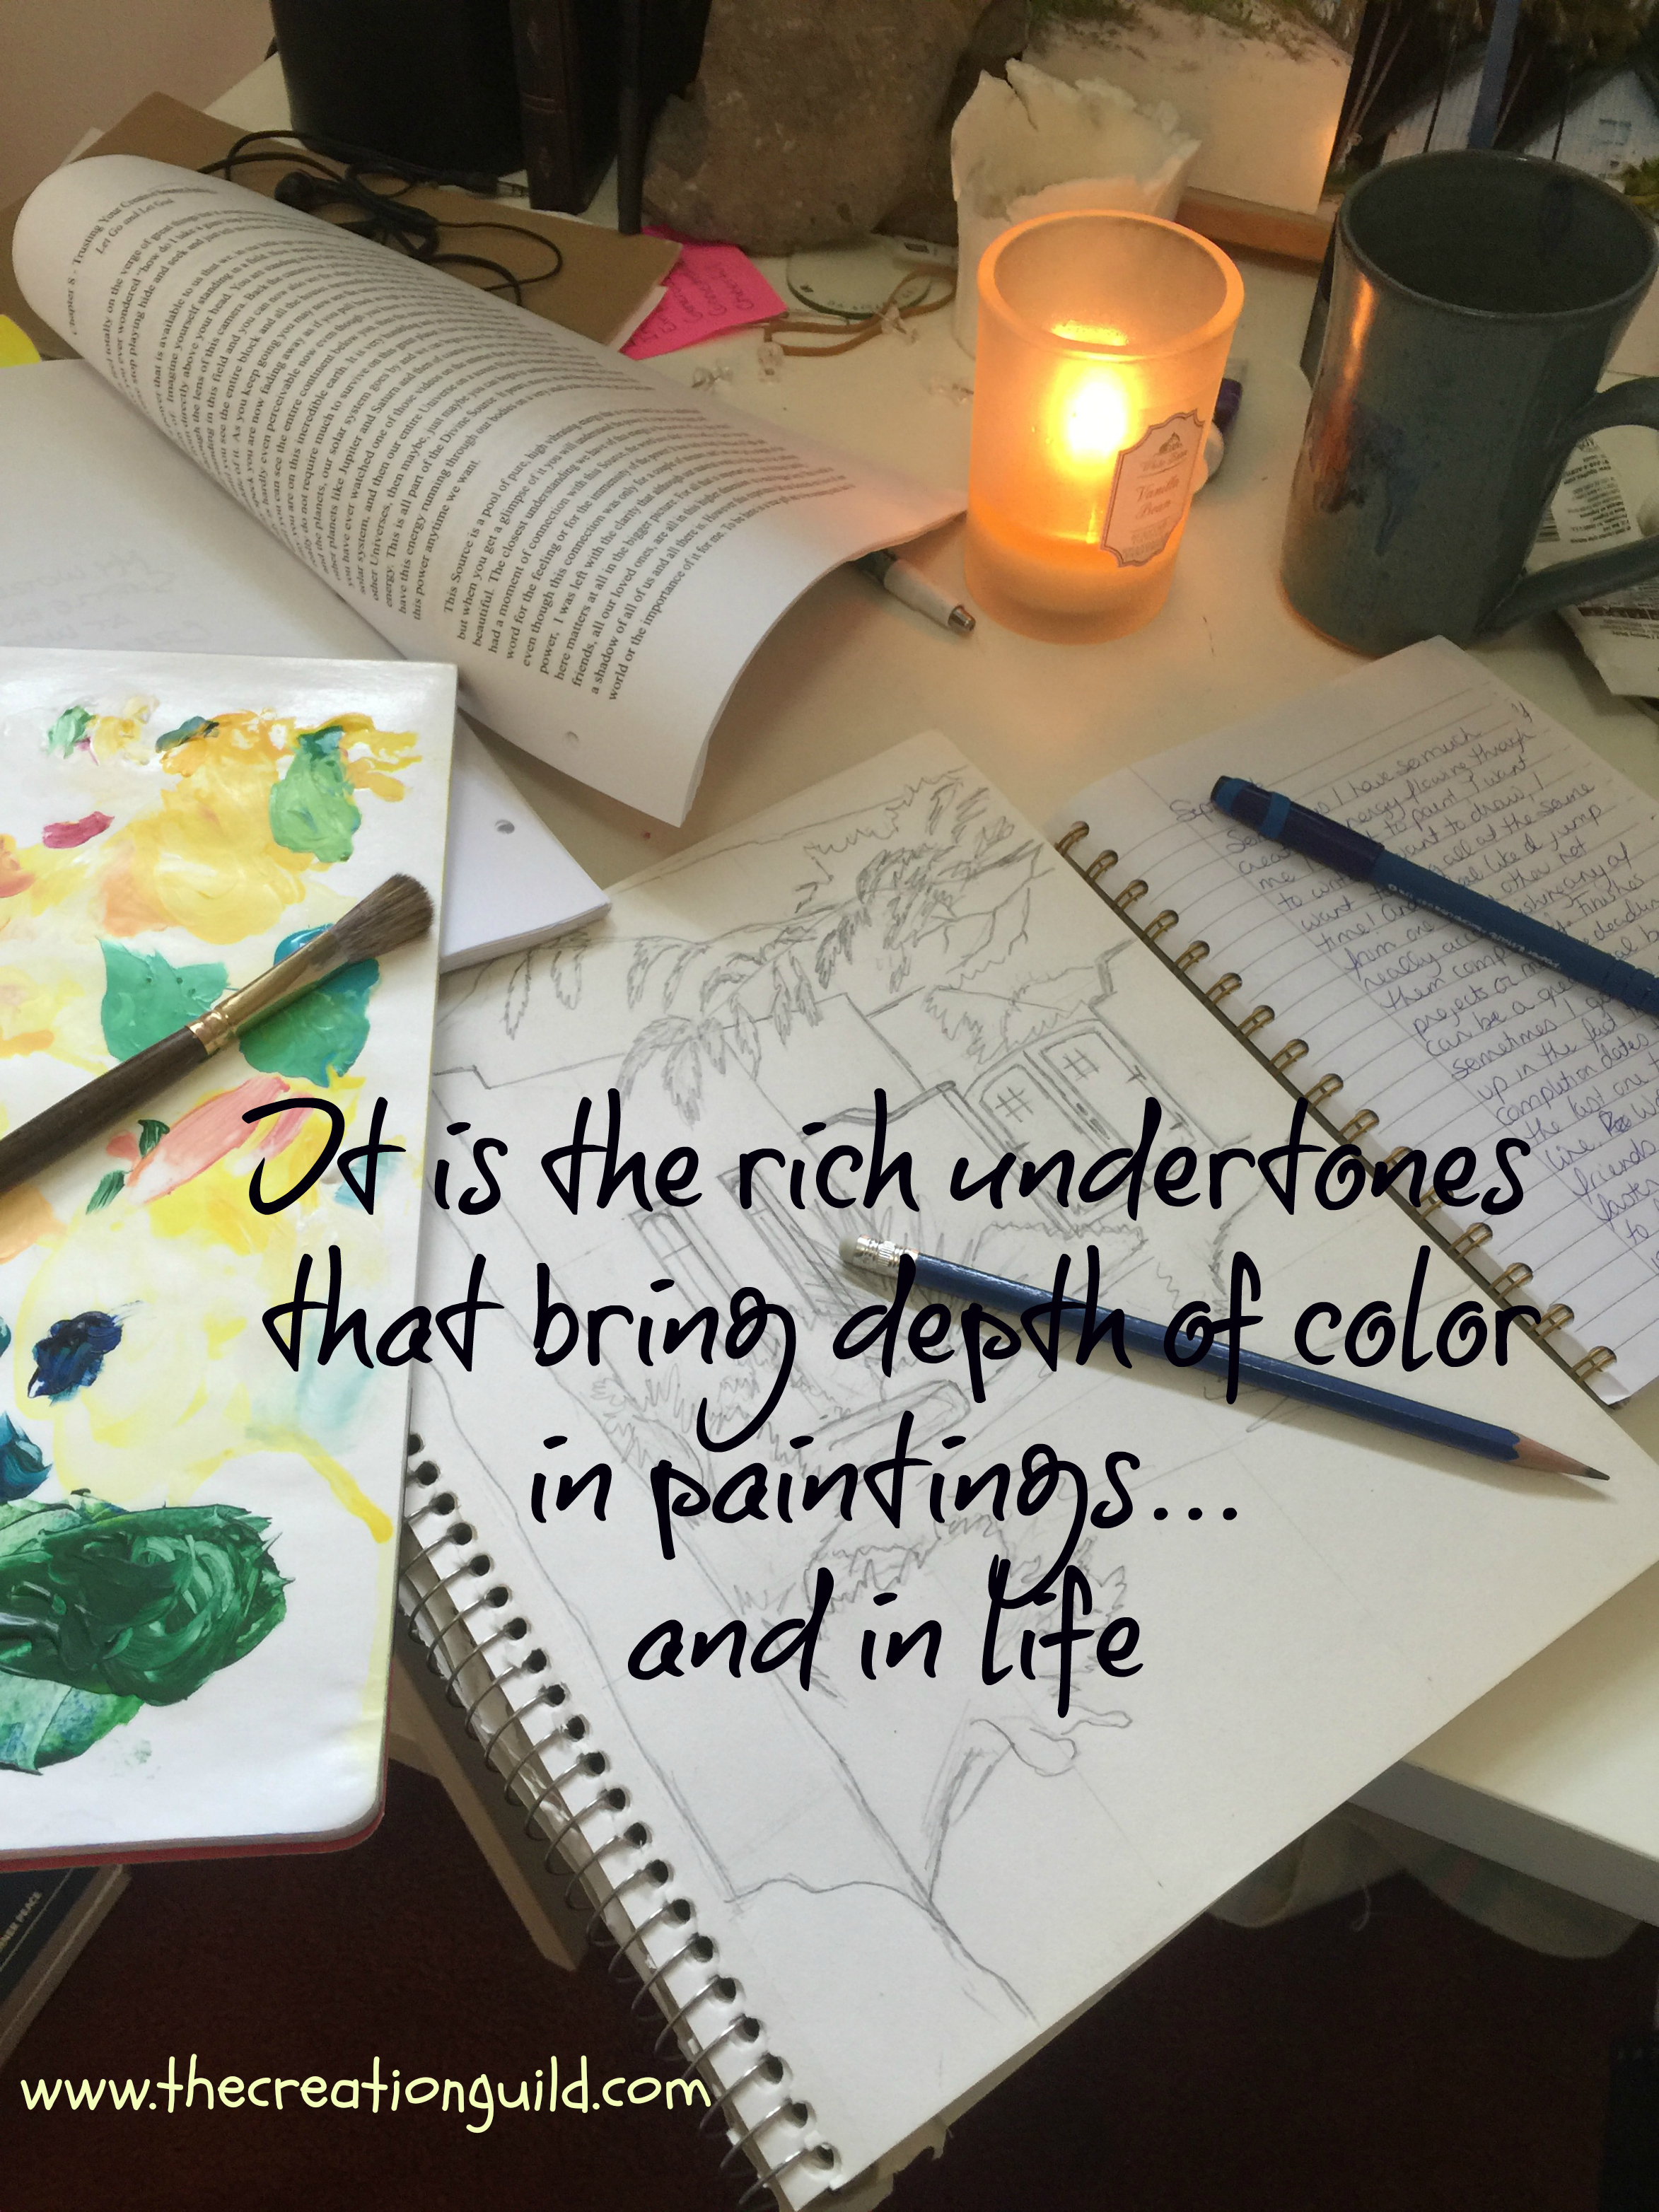 Rich undertones colors & life blog by Janice Gallant https://thecreationguild.com/